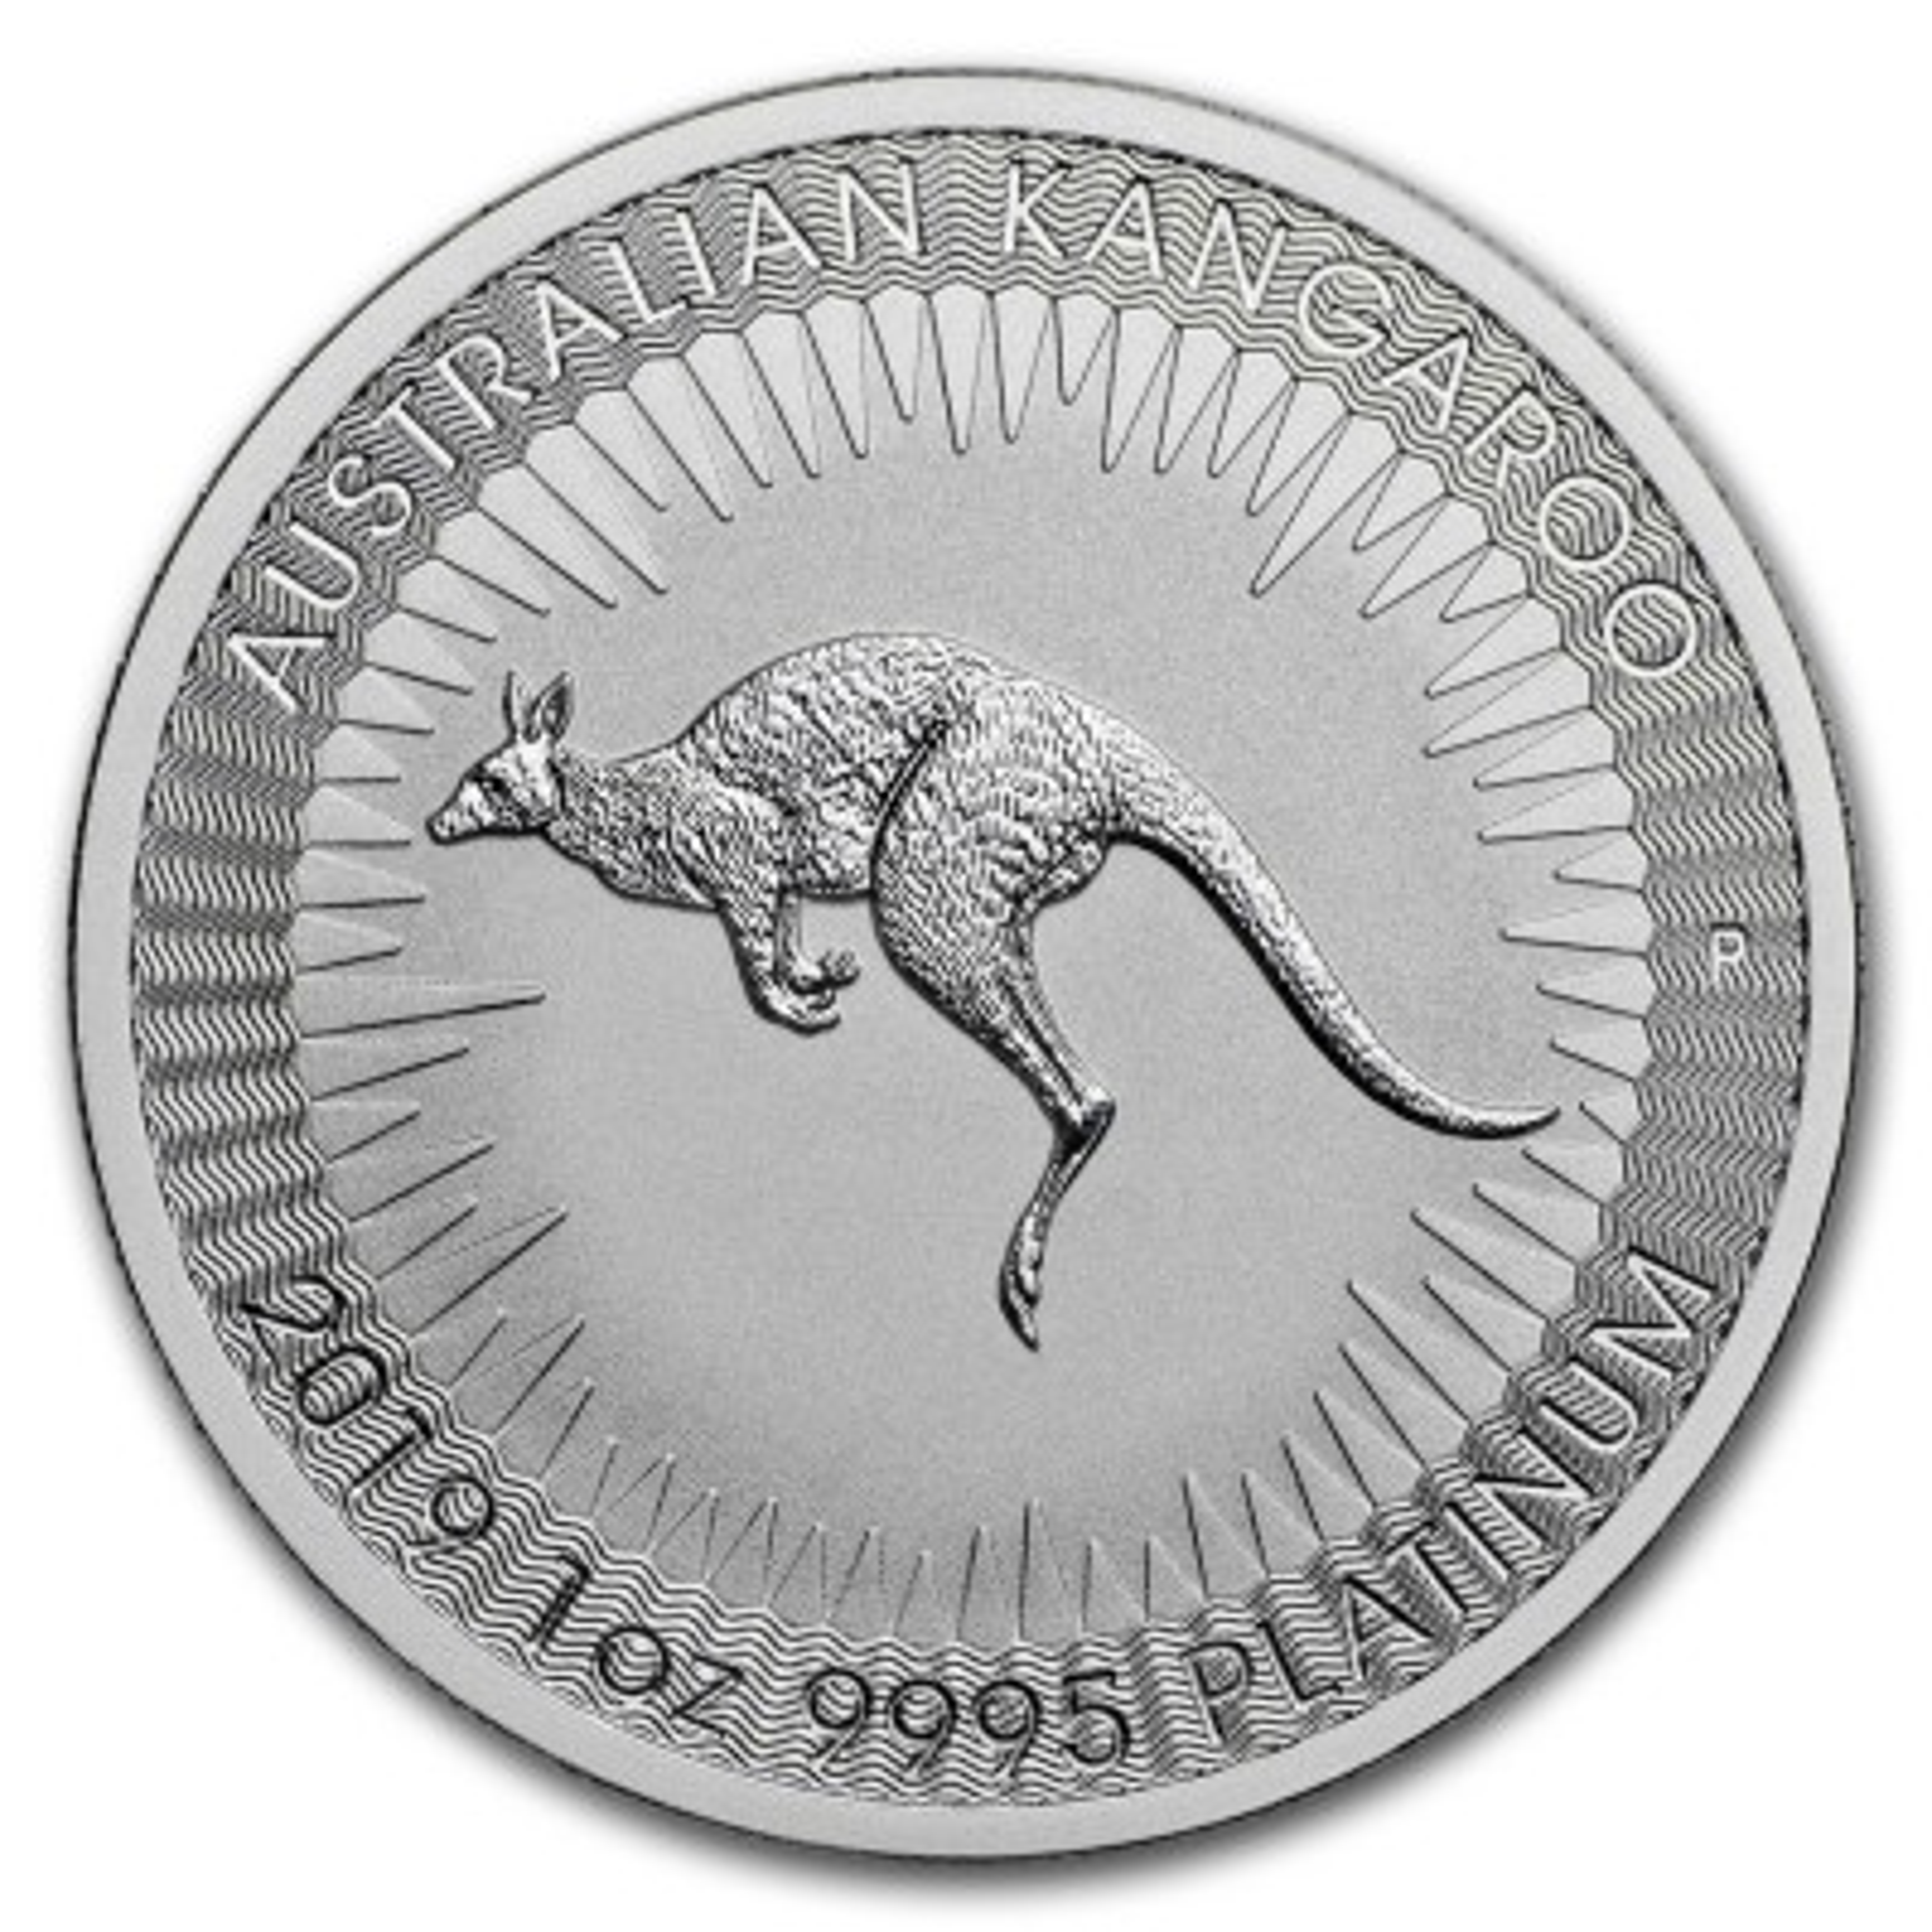 1 Troy ounce Platina Kangaroo munt 2020